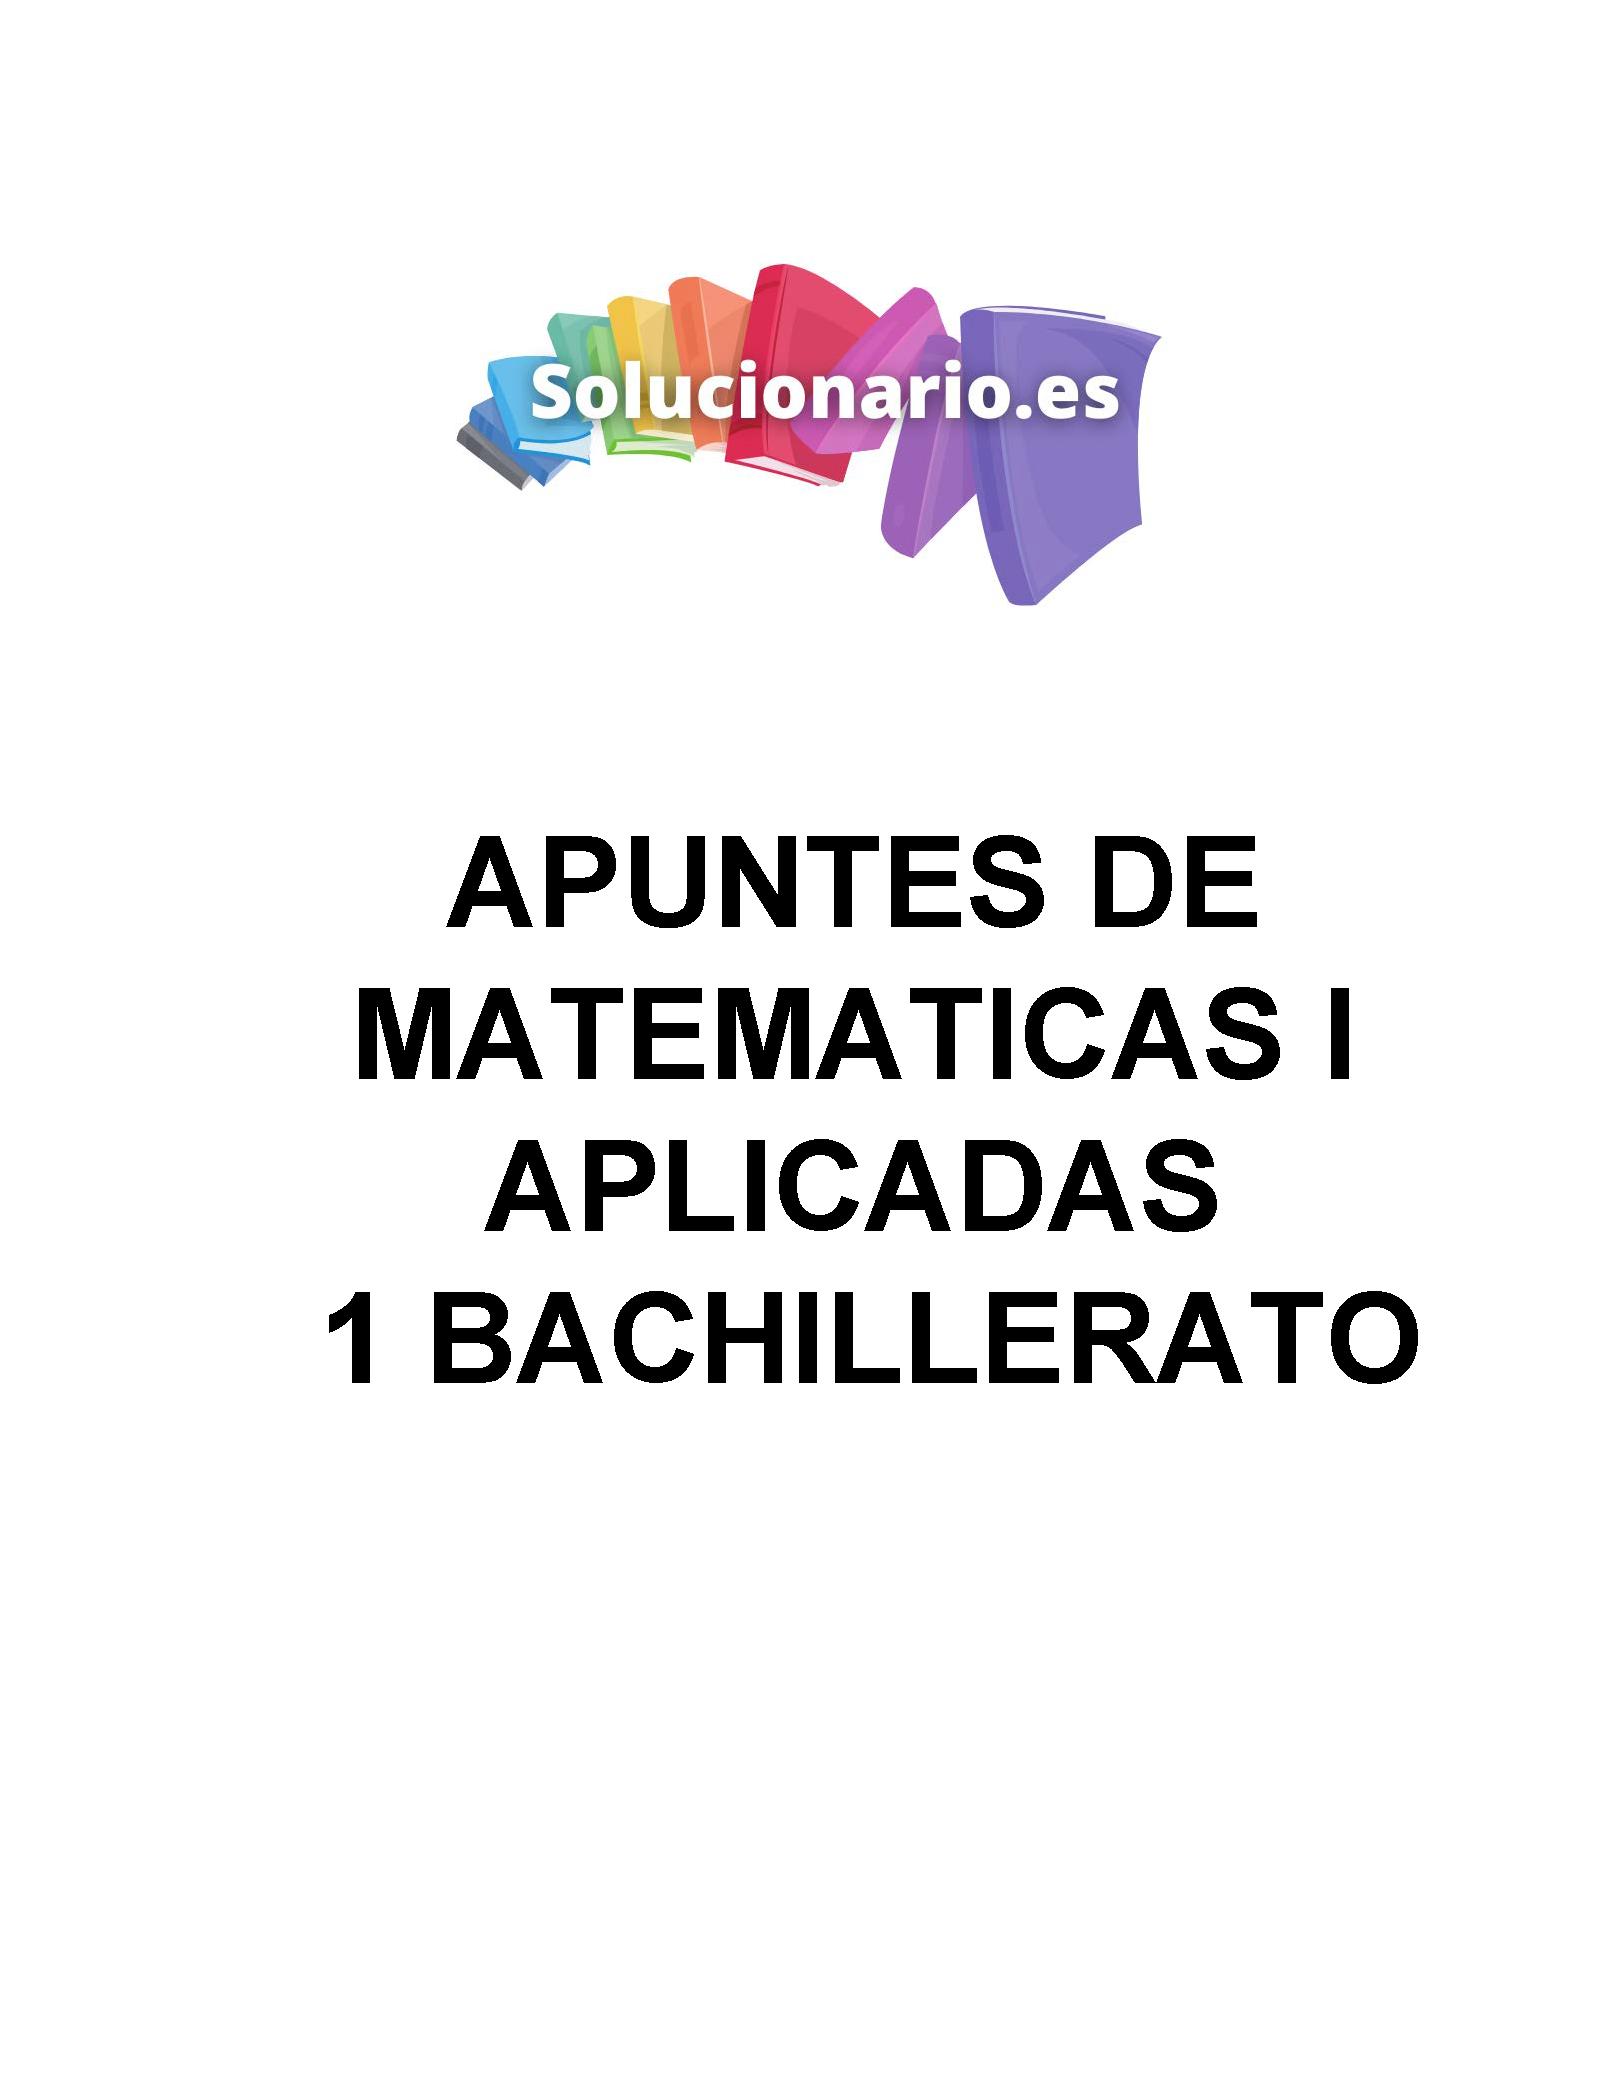 Apuntes Matemáticas Aritmética 1 Bachillerato de Sociales 2020 / 2021